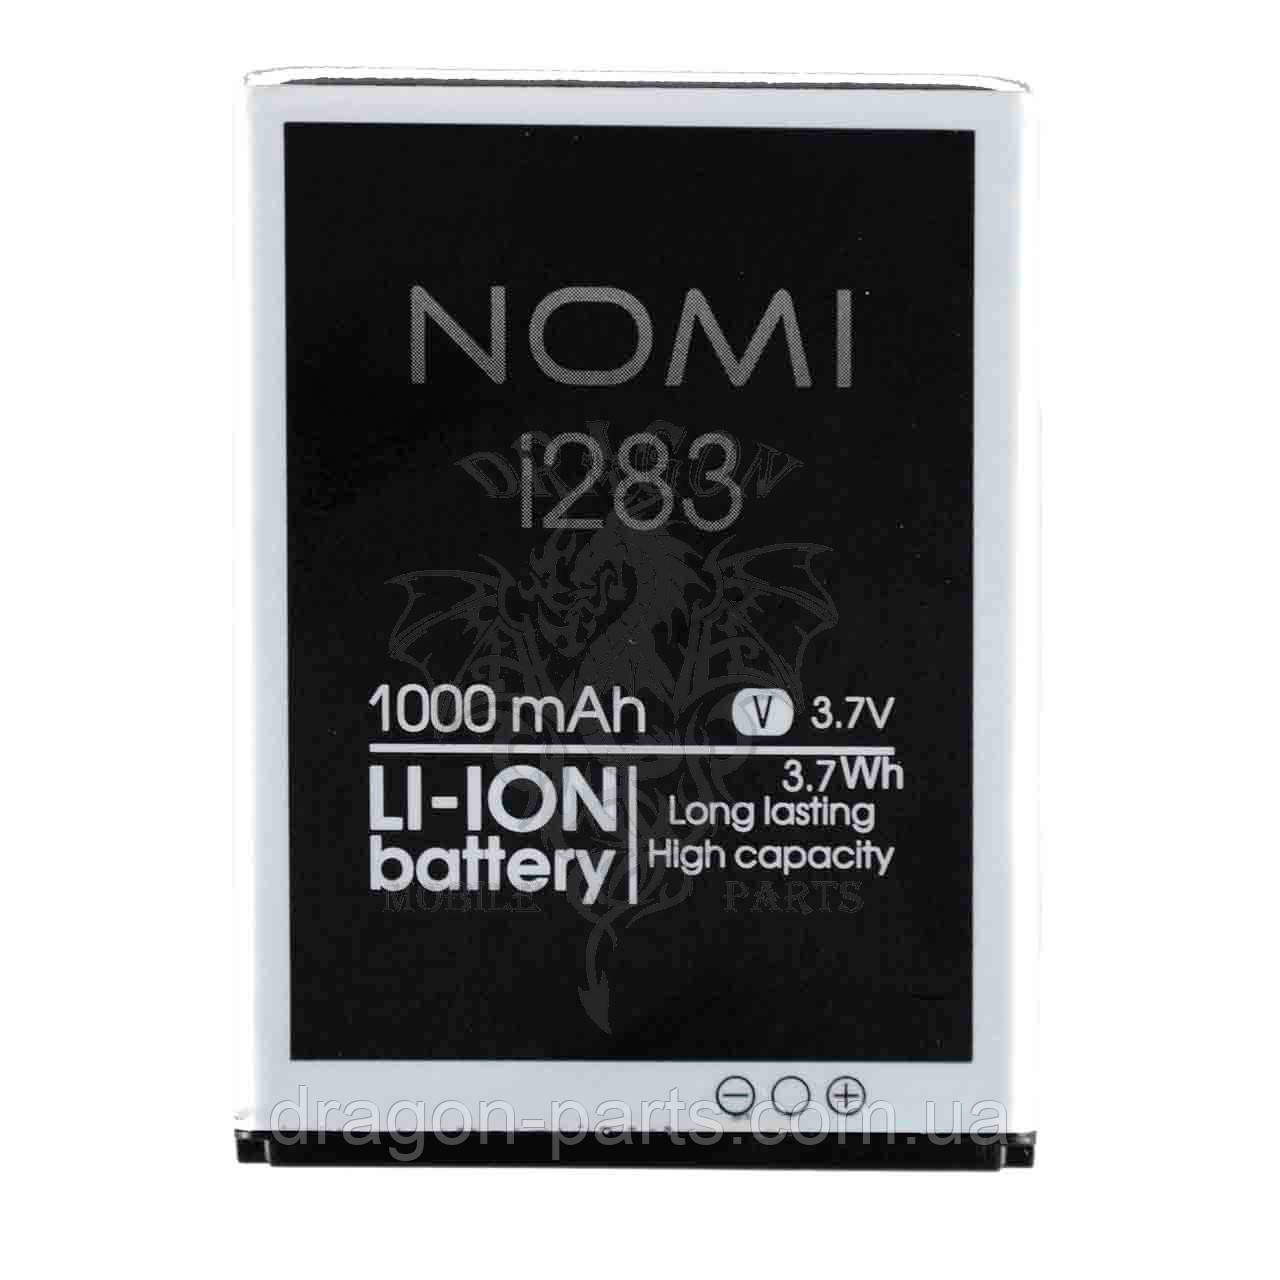 Аккумуляторная батарея (АКБ) Nomi i283, оригинал